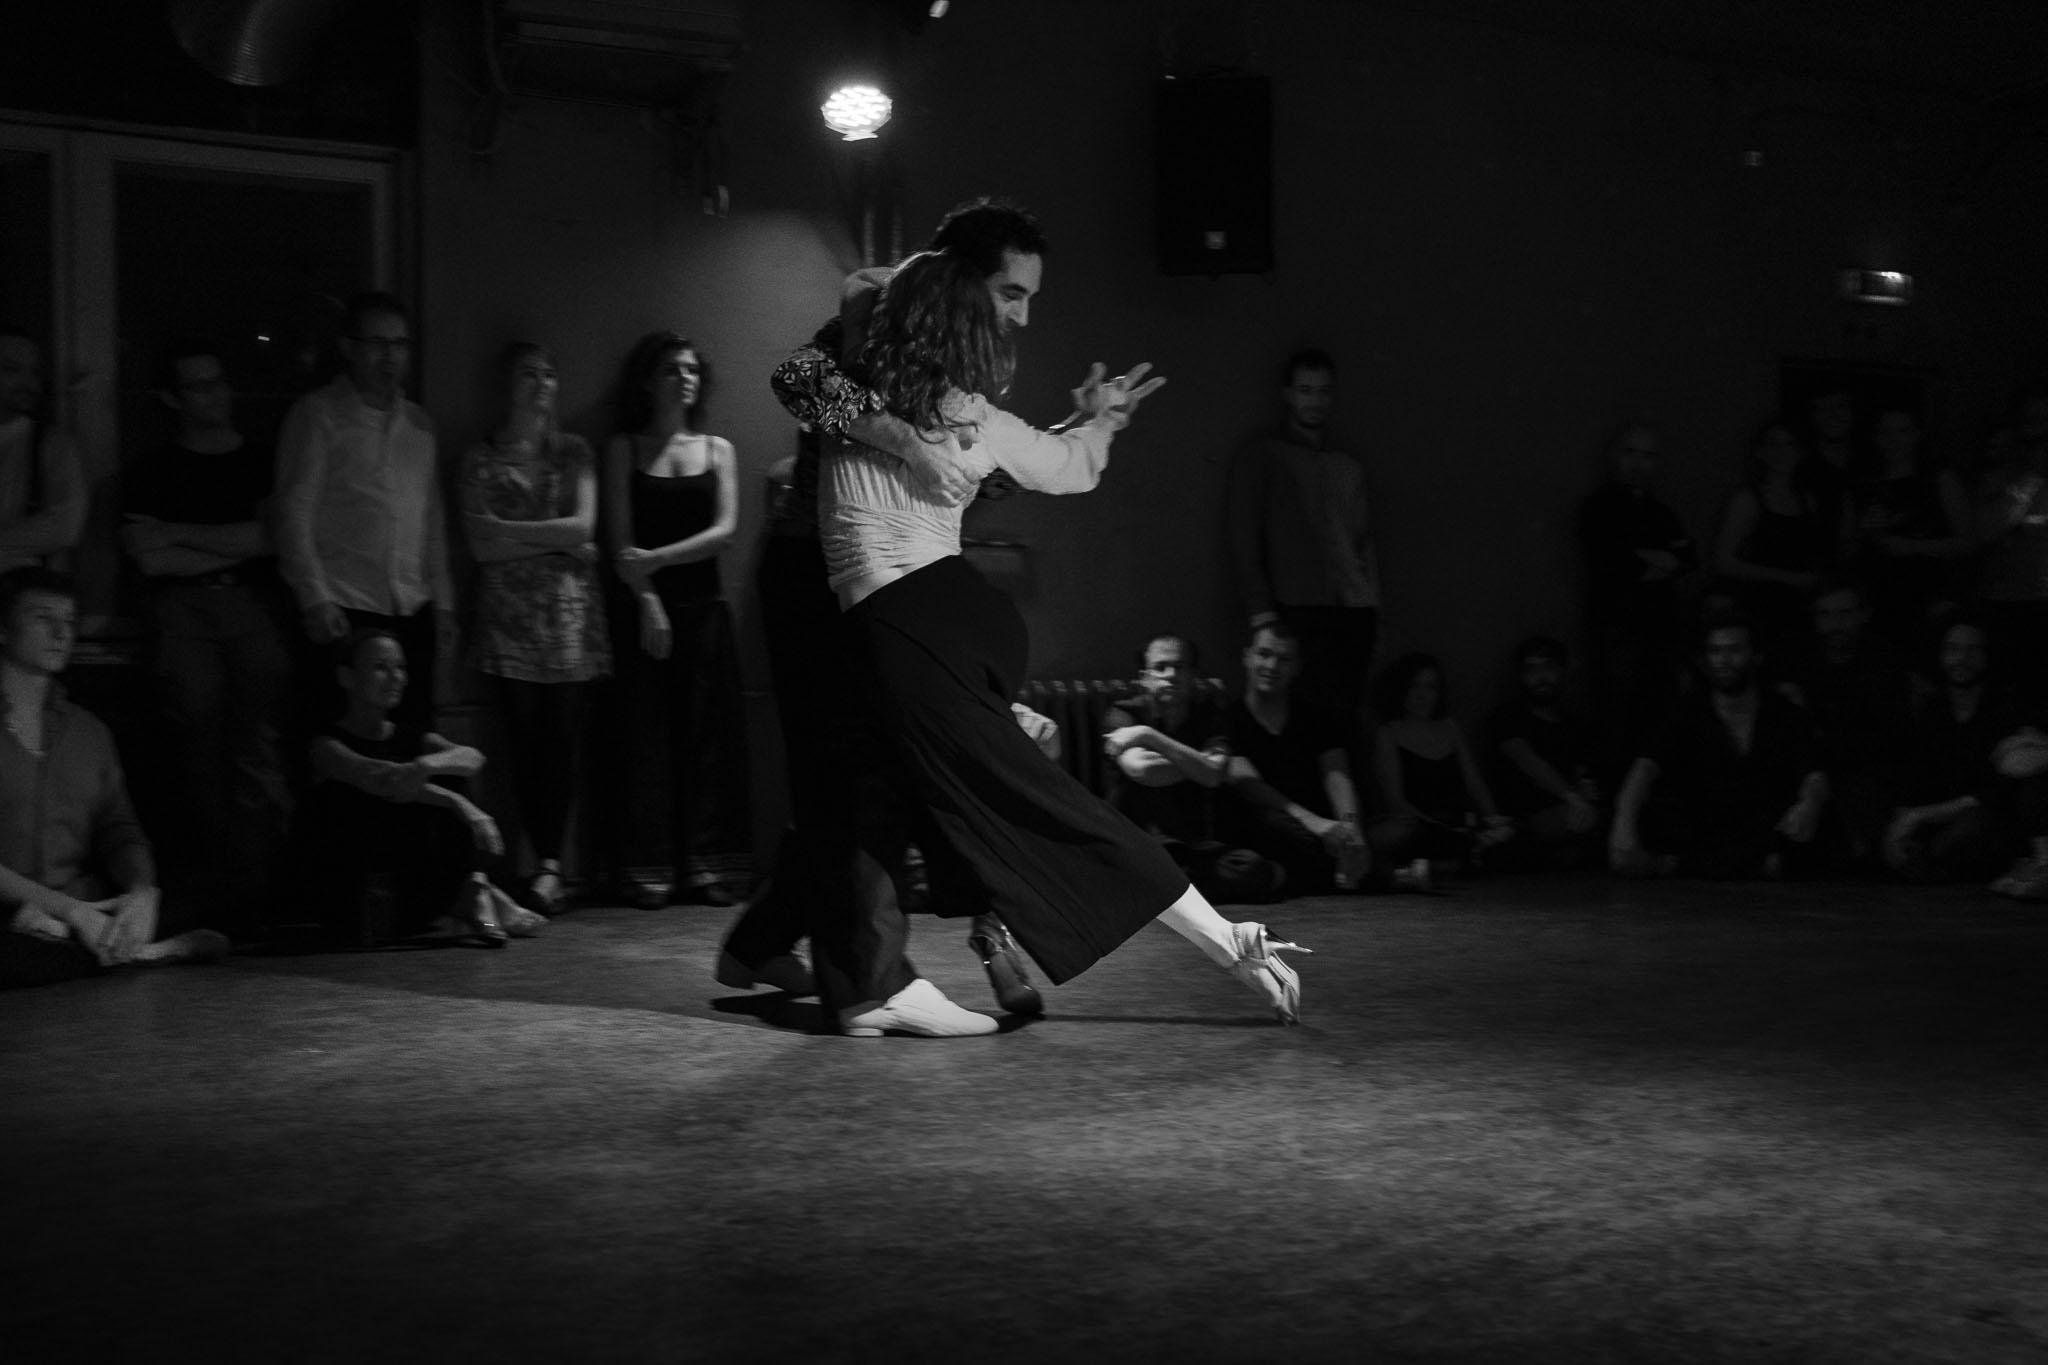 Louisa & Armin, Berlin, 2019